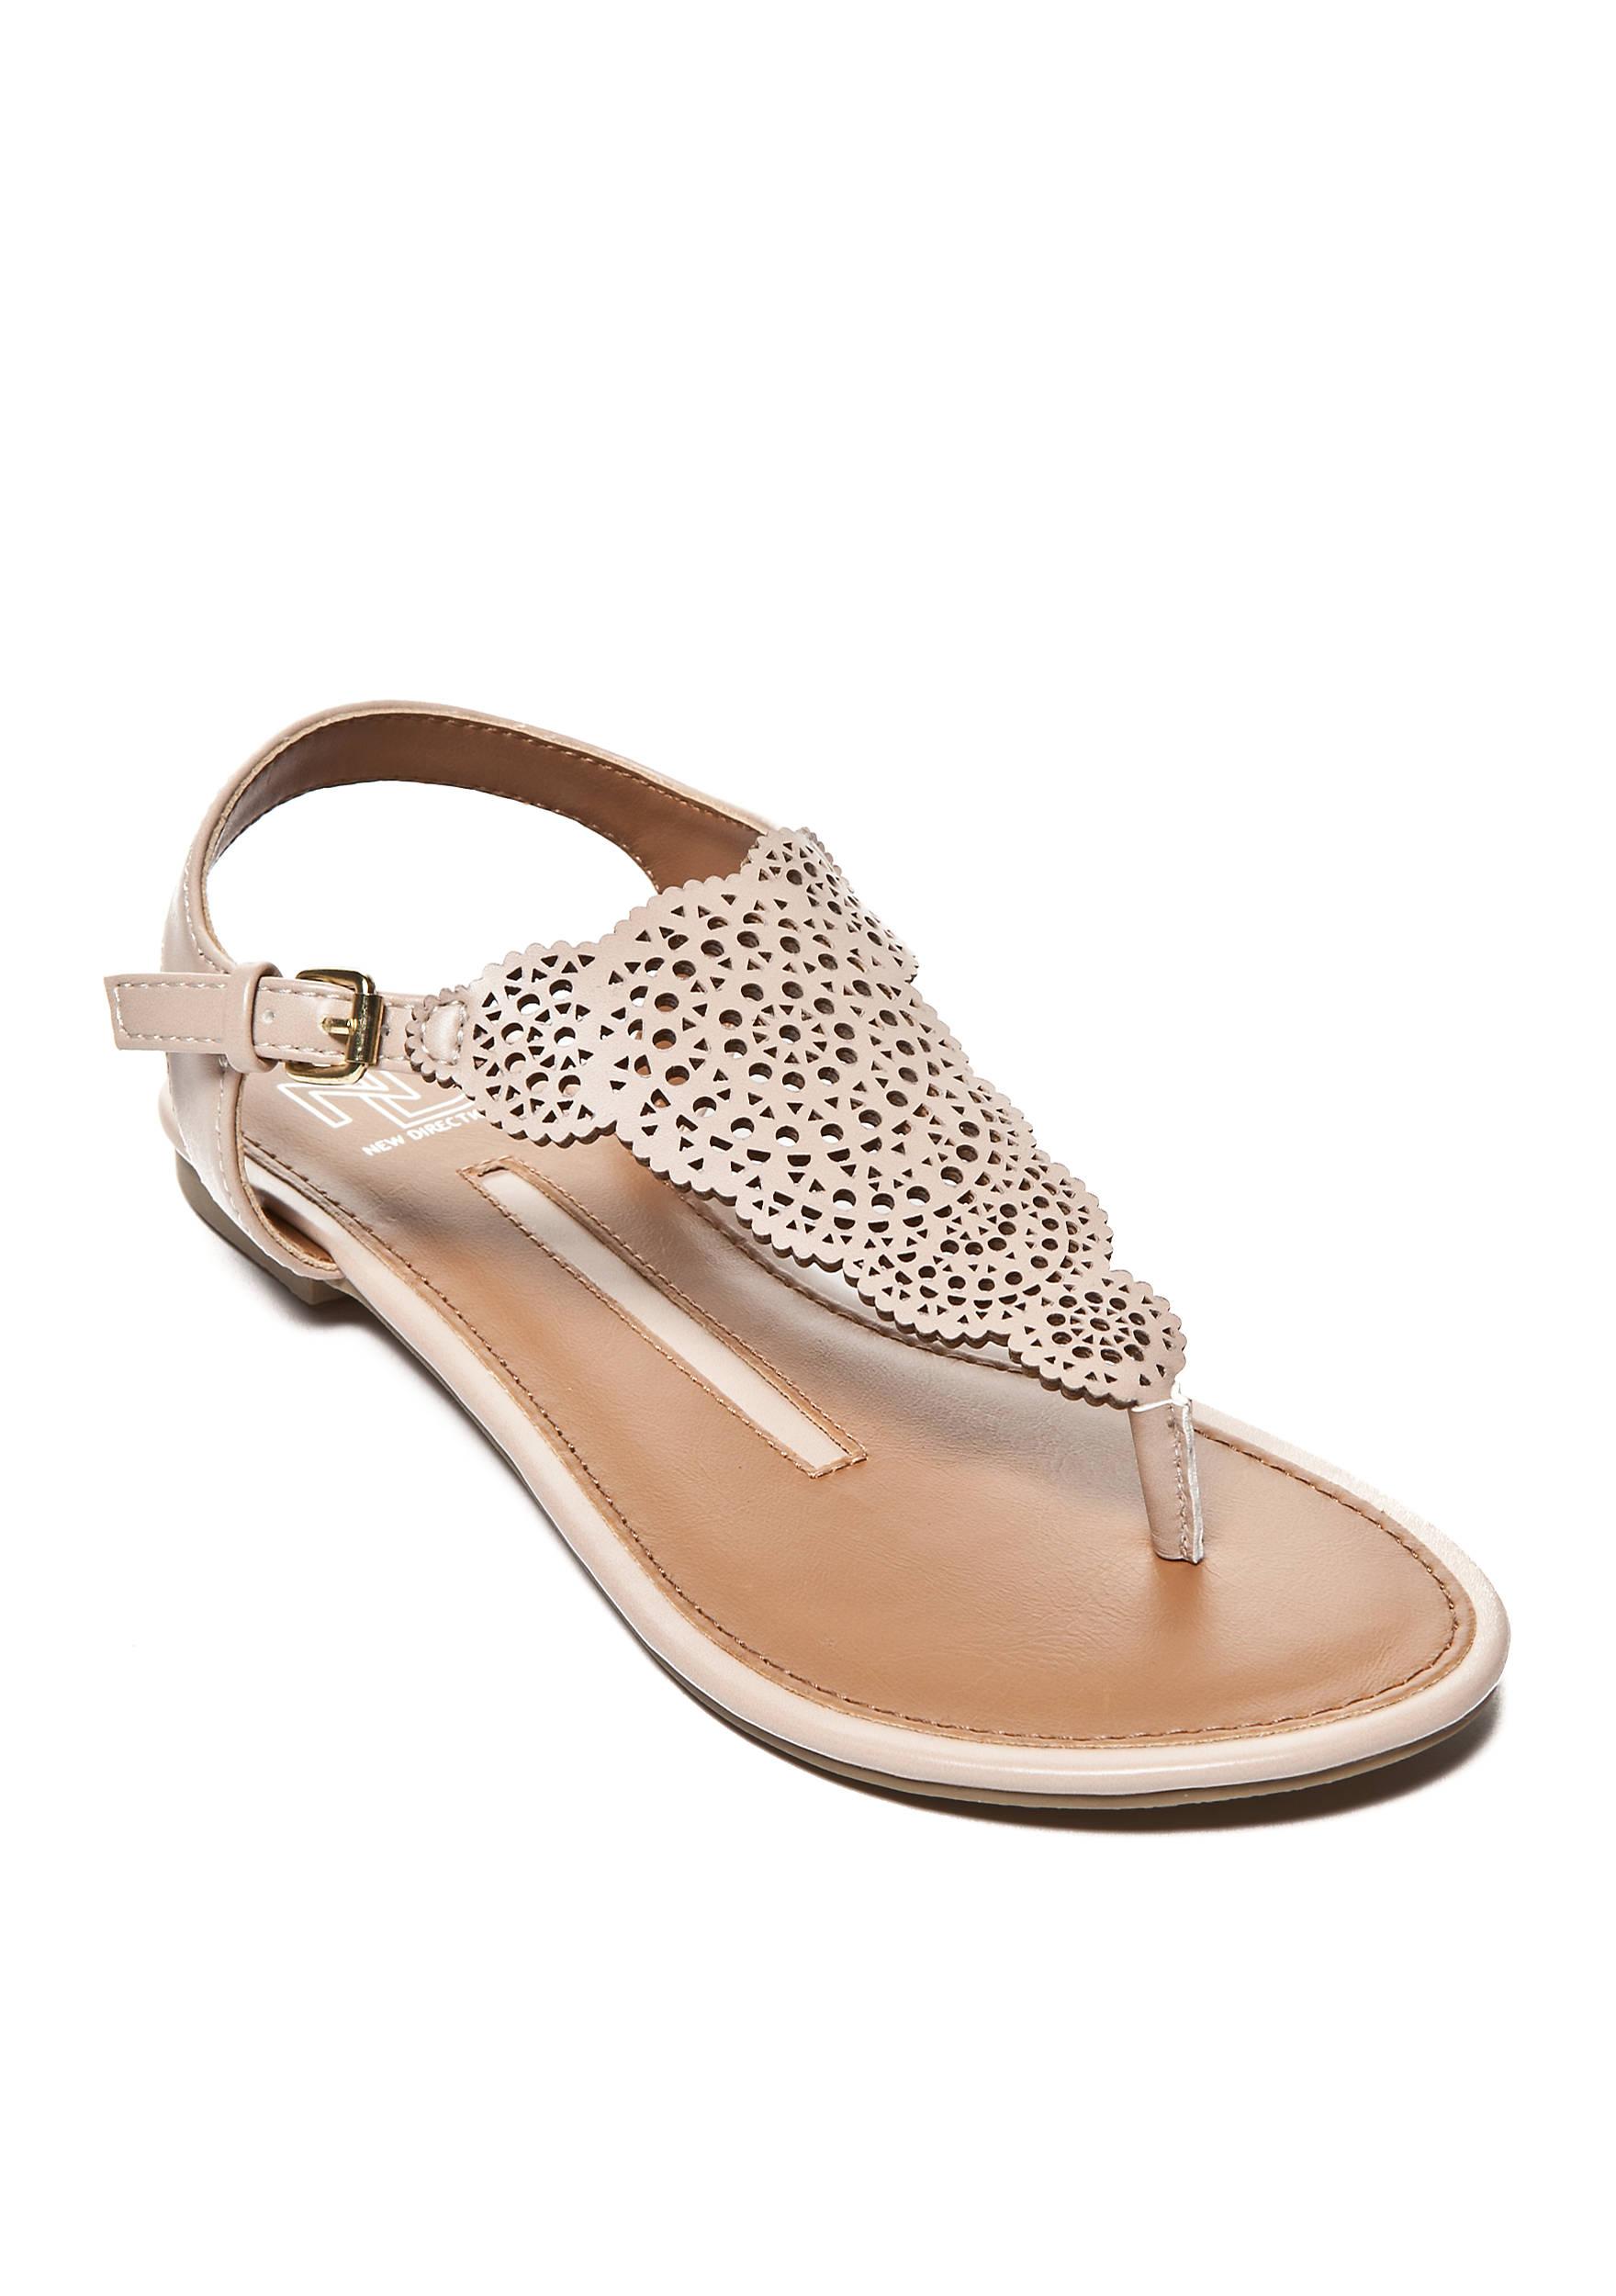 Flat sandals - Images Lily Flat Sandals